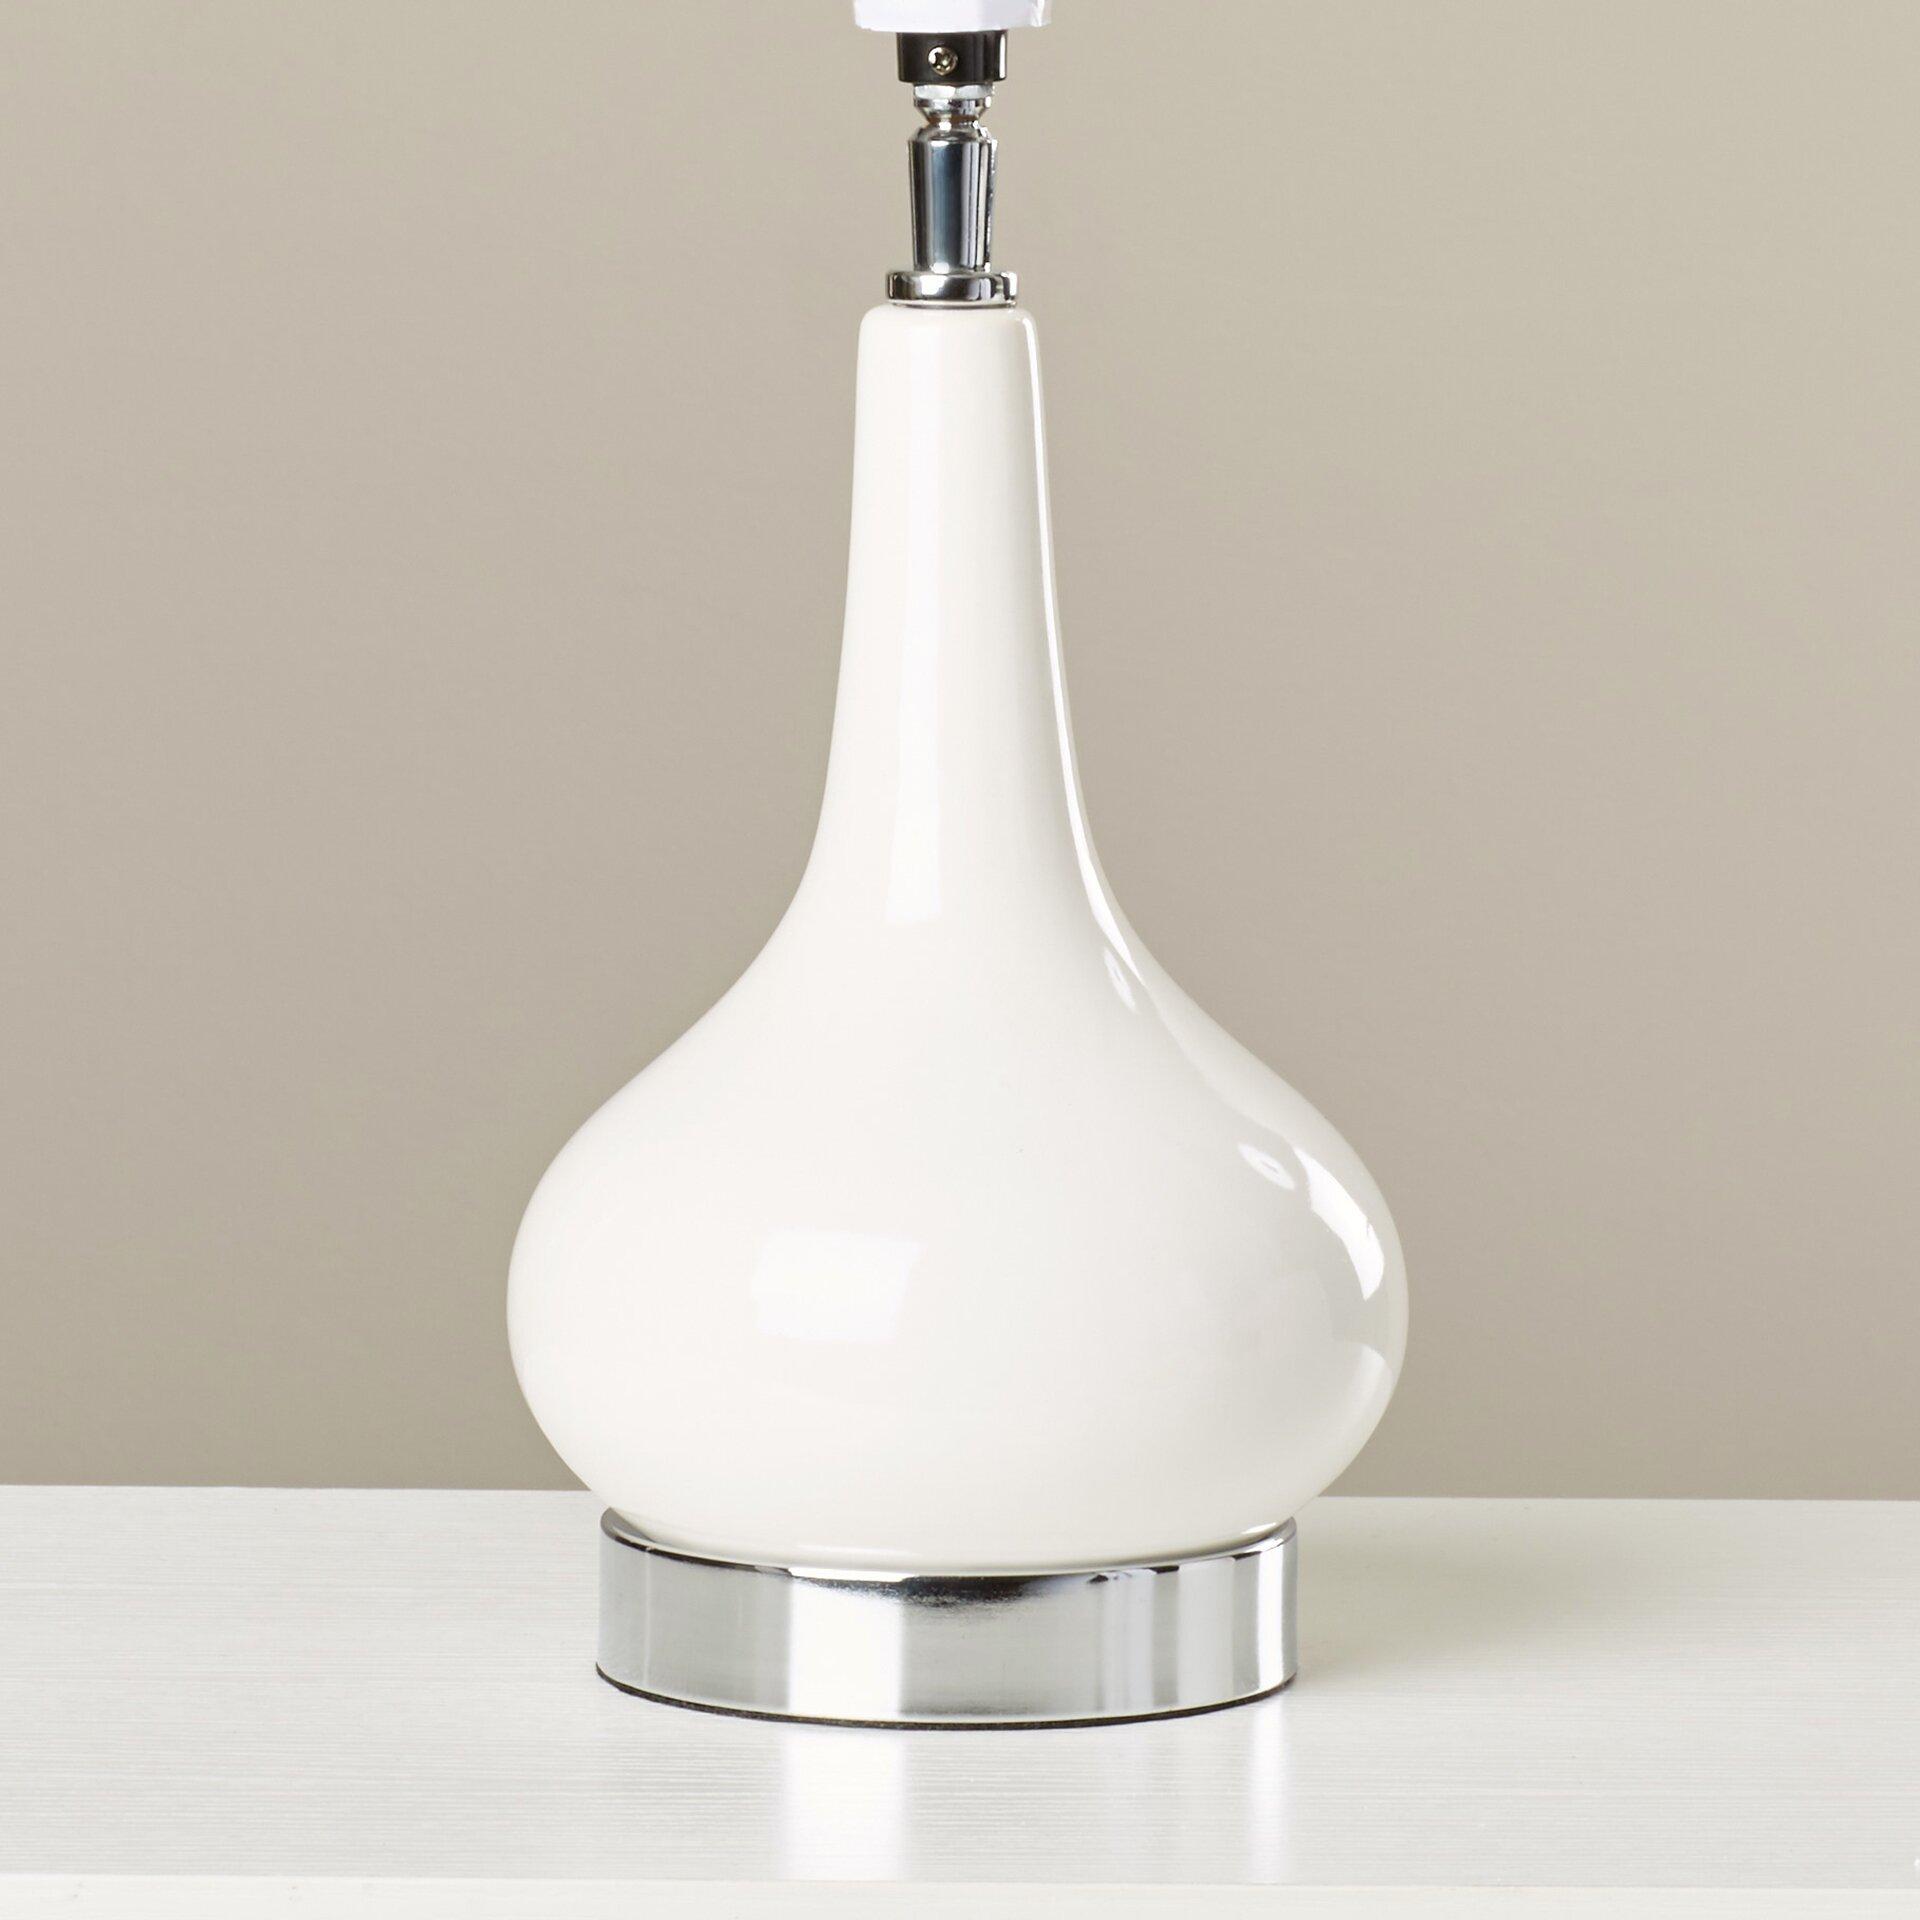 Brayden Studio Moynihan Table Lamp Amp Reviews Wayfair